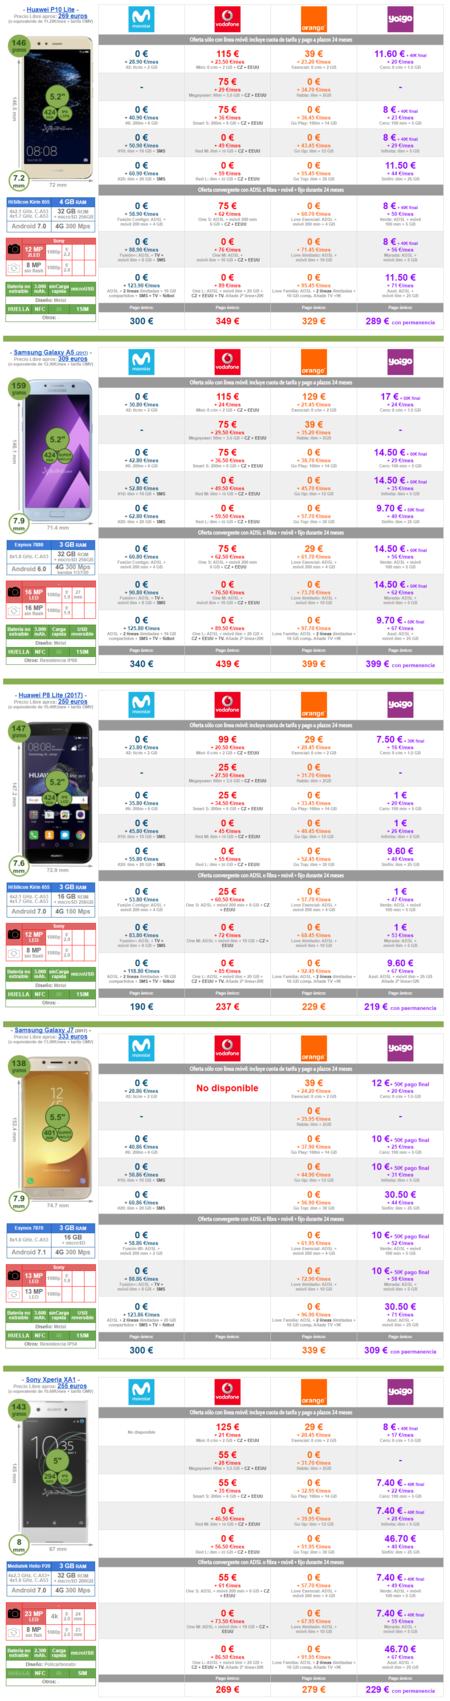 Mejor Precio A Plazos Smartphones Gama Media Alrededor De 300 Euros